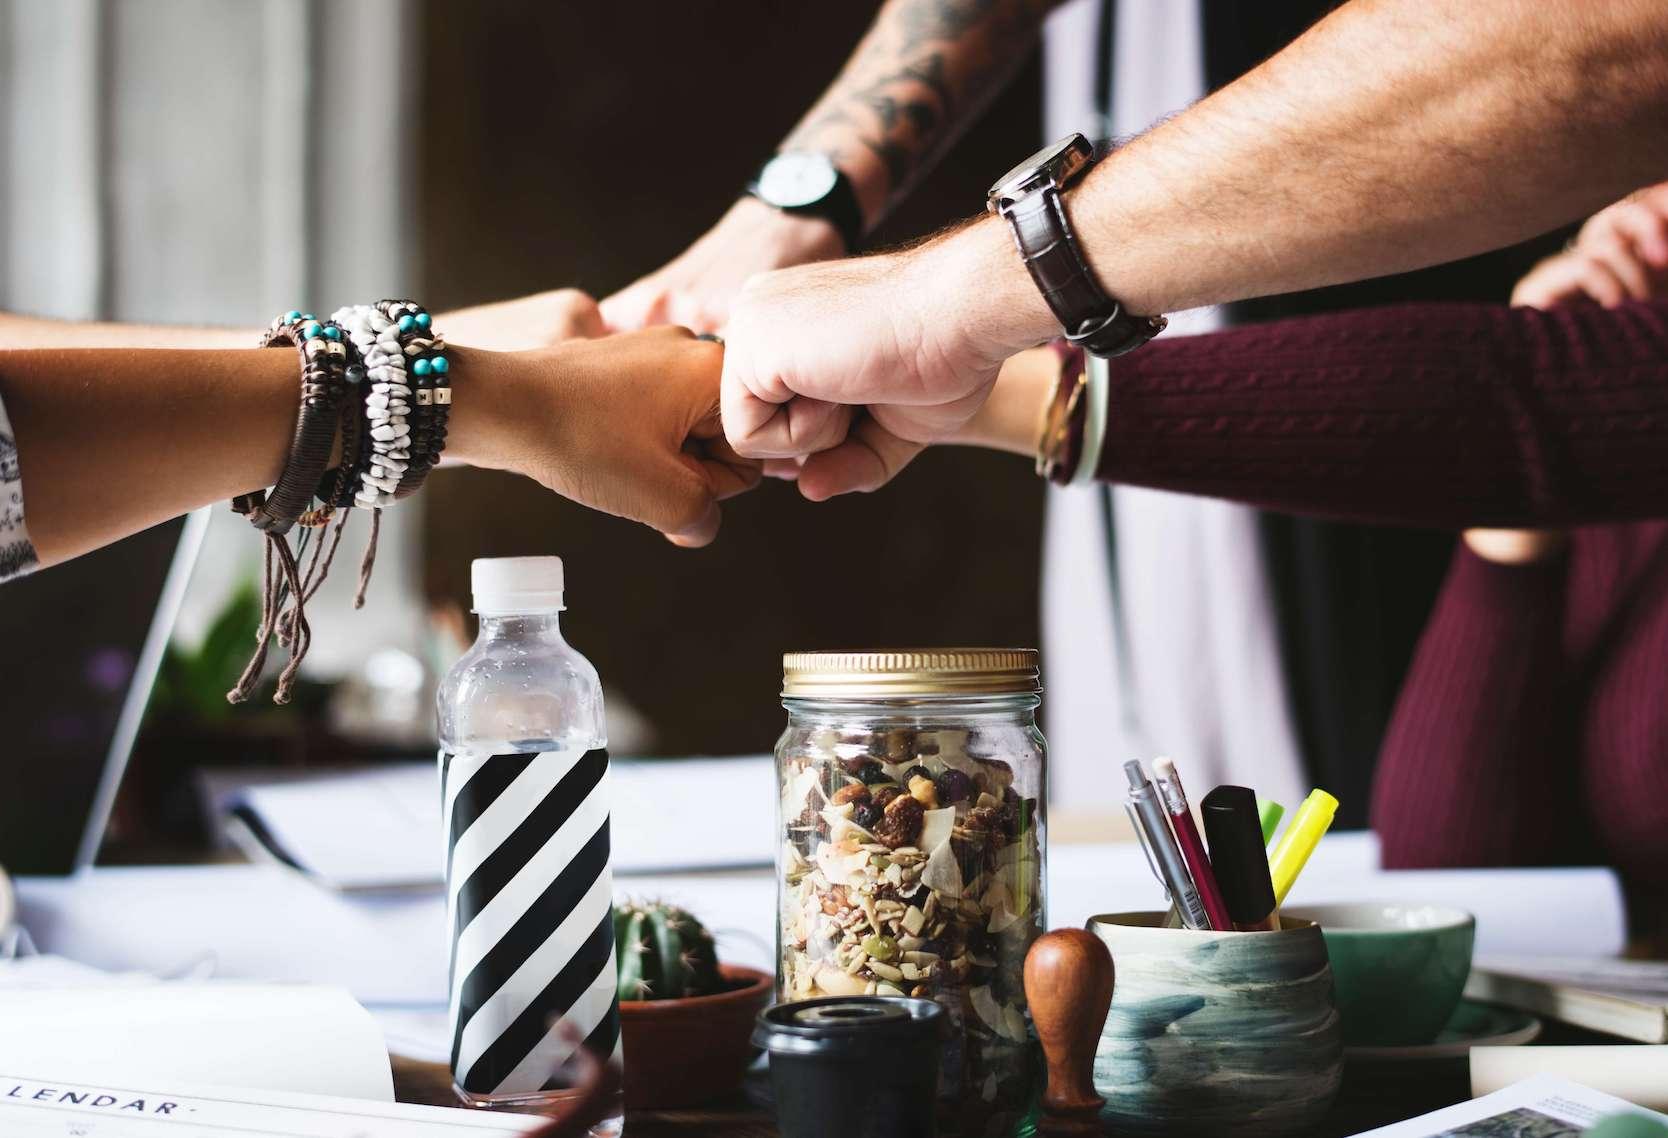 Employee Starts 'Vegan Movement' at Dropbox